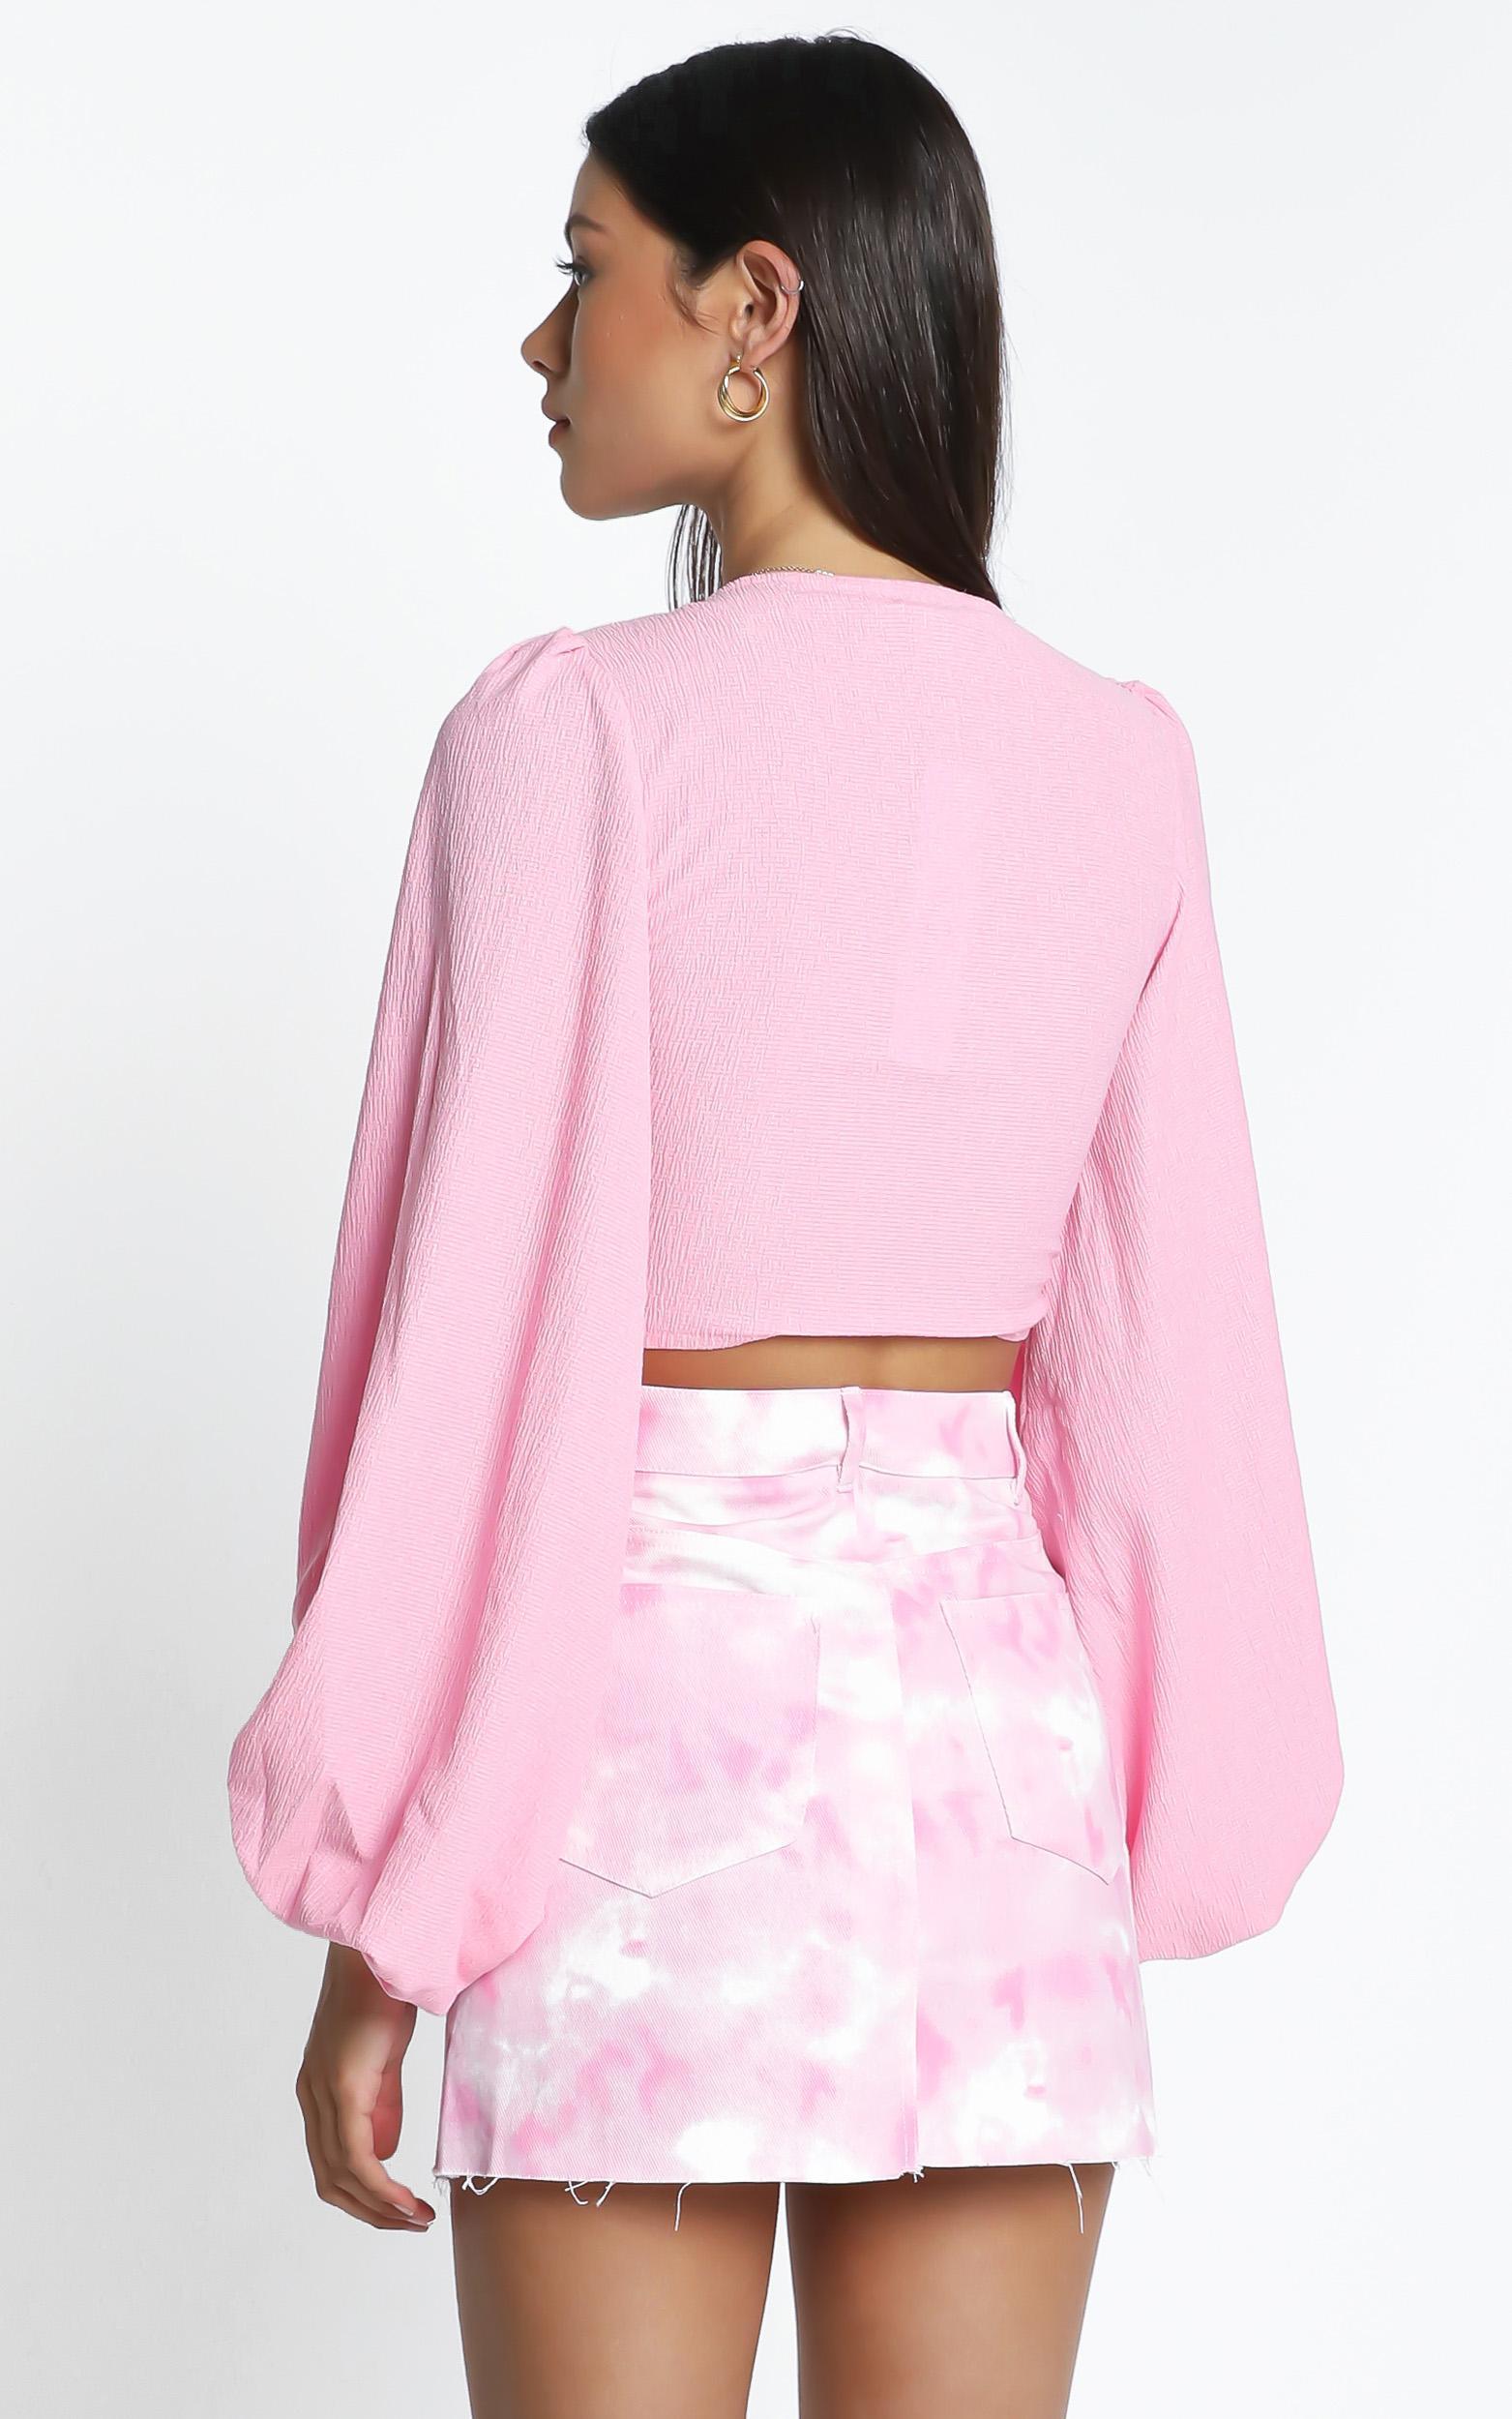 Sasha Top in Pink - 12 (L), Pink, hi-res image number null